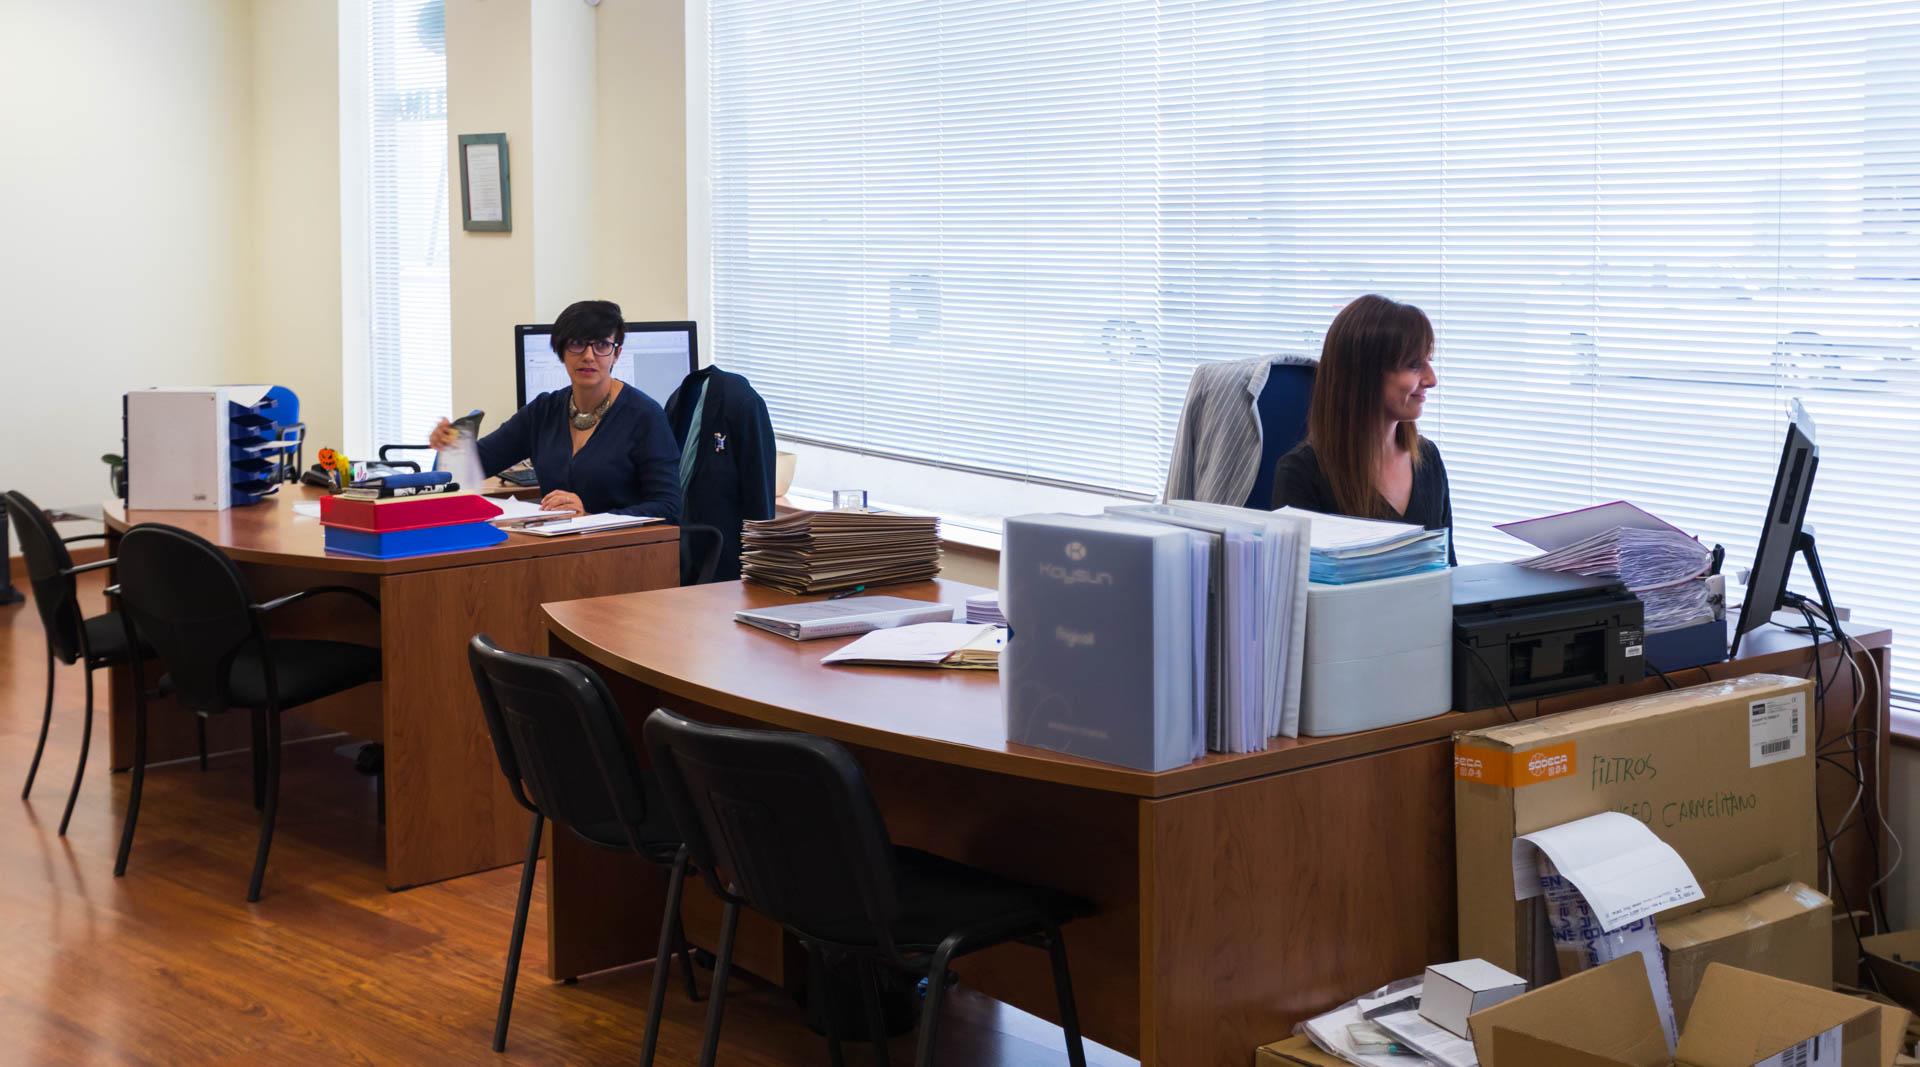 Oficina interclima 2 interclima salamanca for Oficina correos salamanca